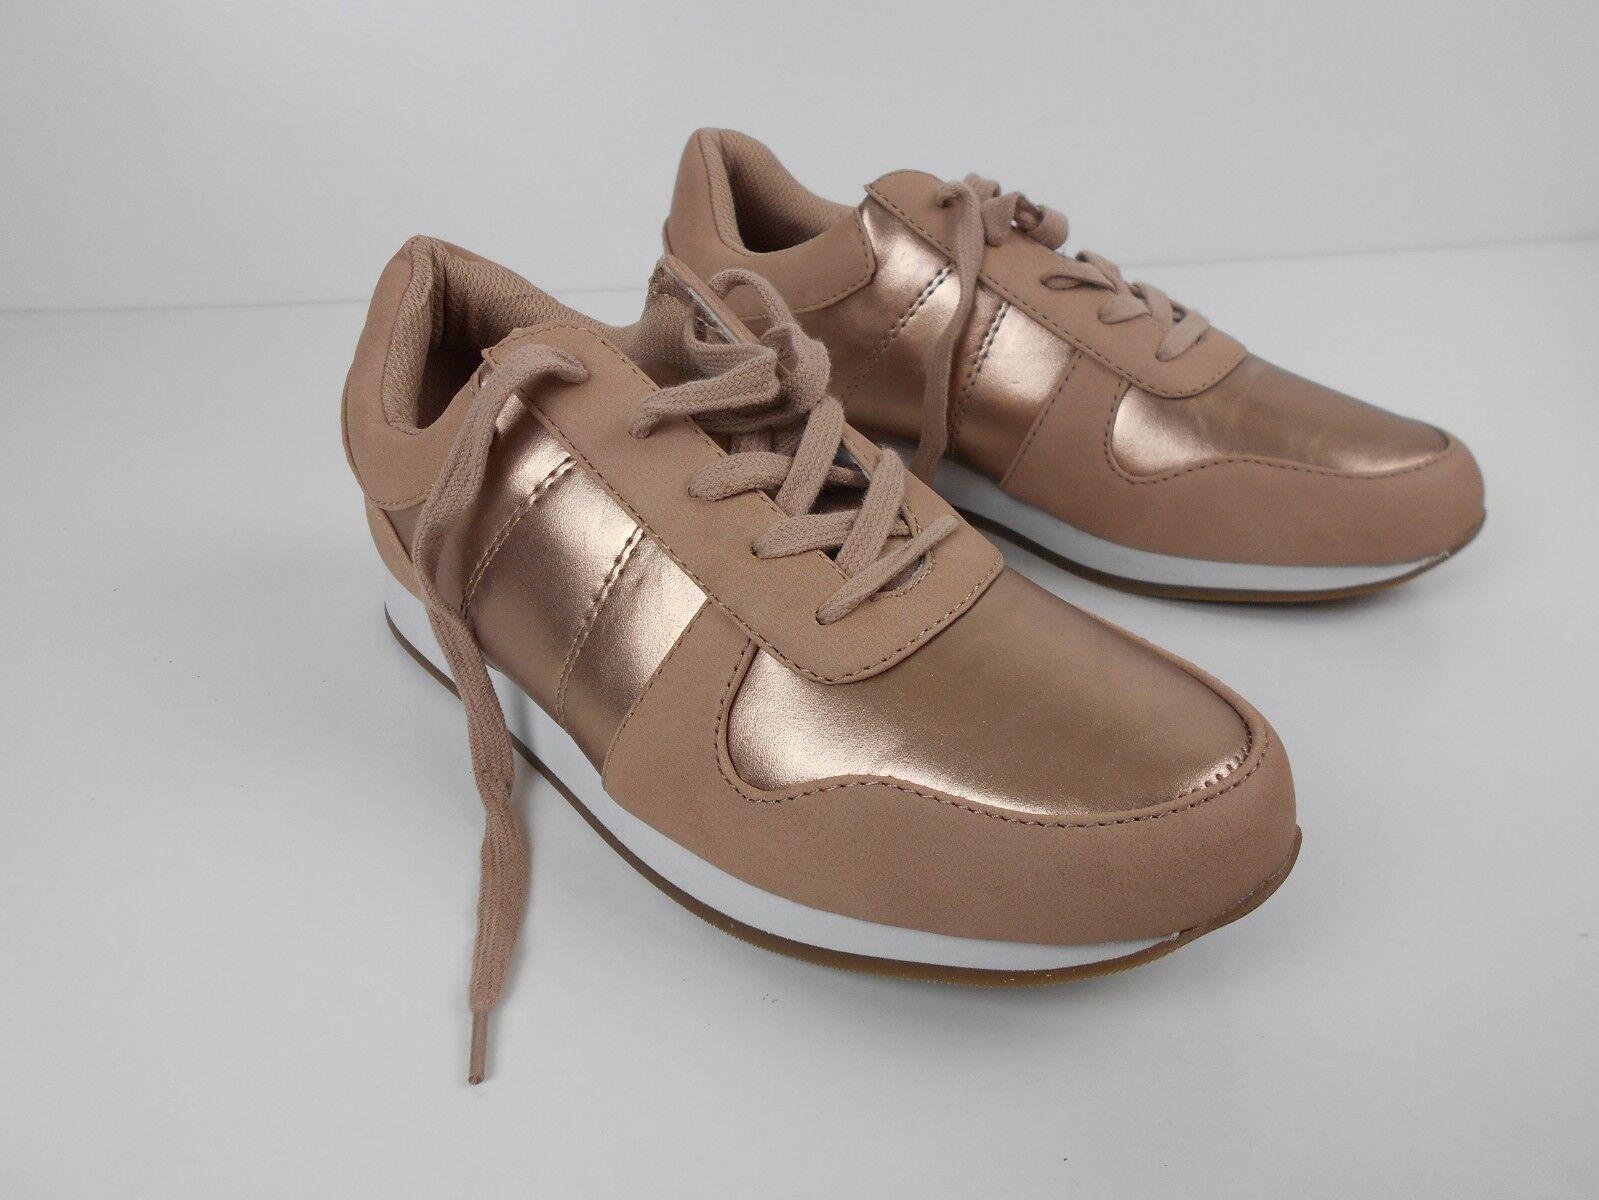 Authentic American Heritage SO Womens Flash Sneakers sz 9 bluesh NEW